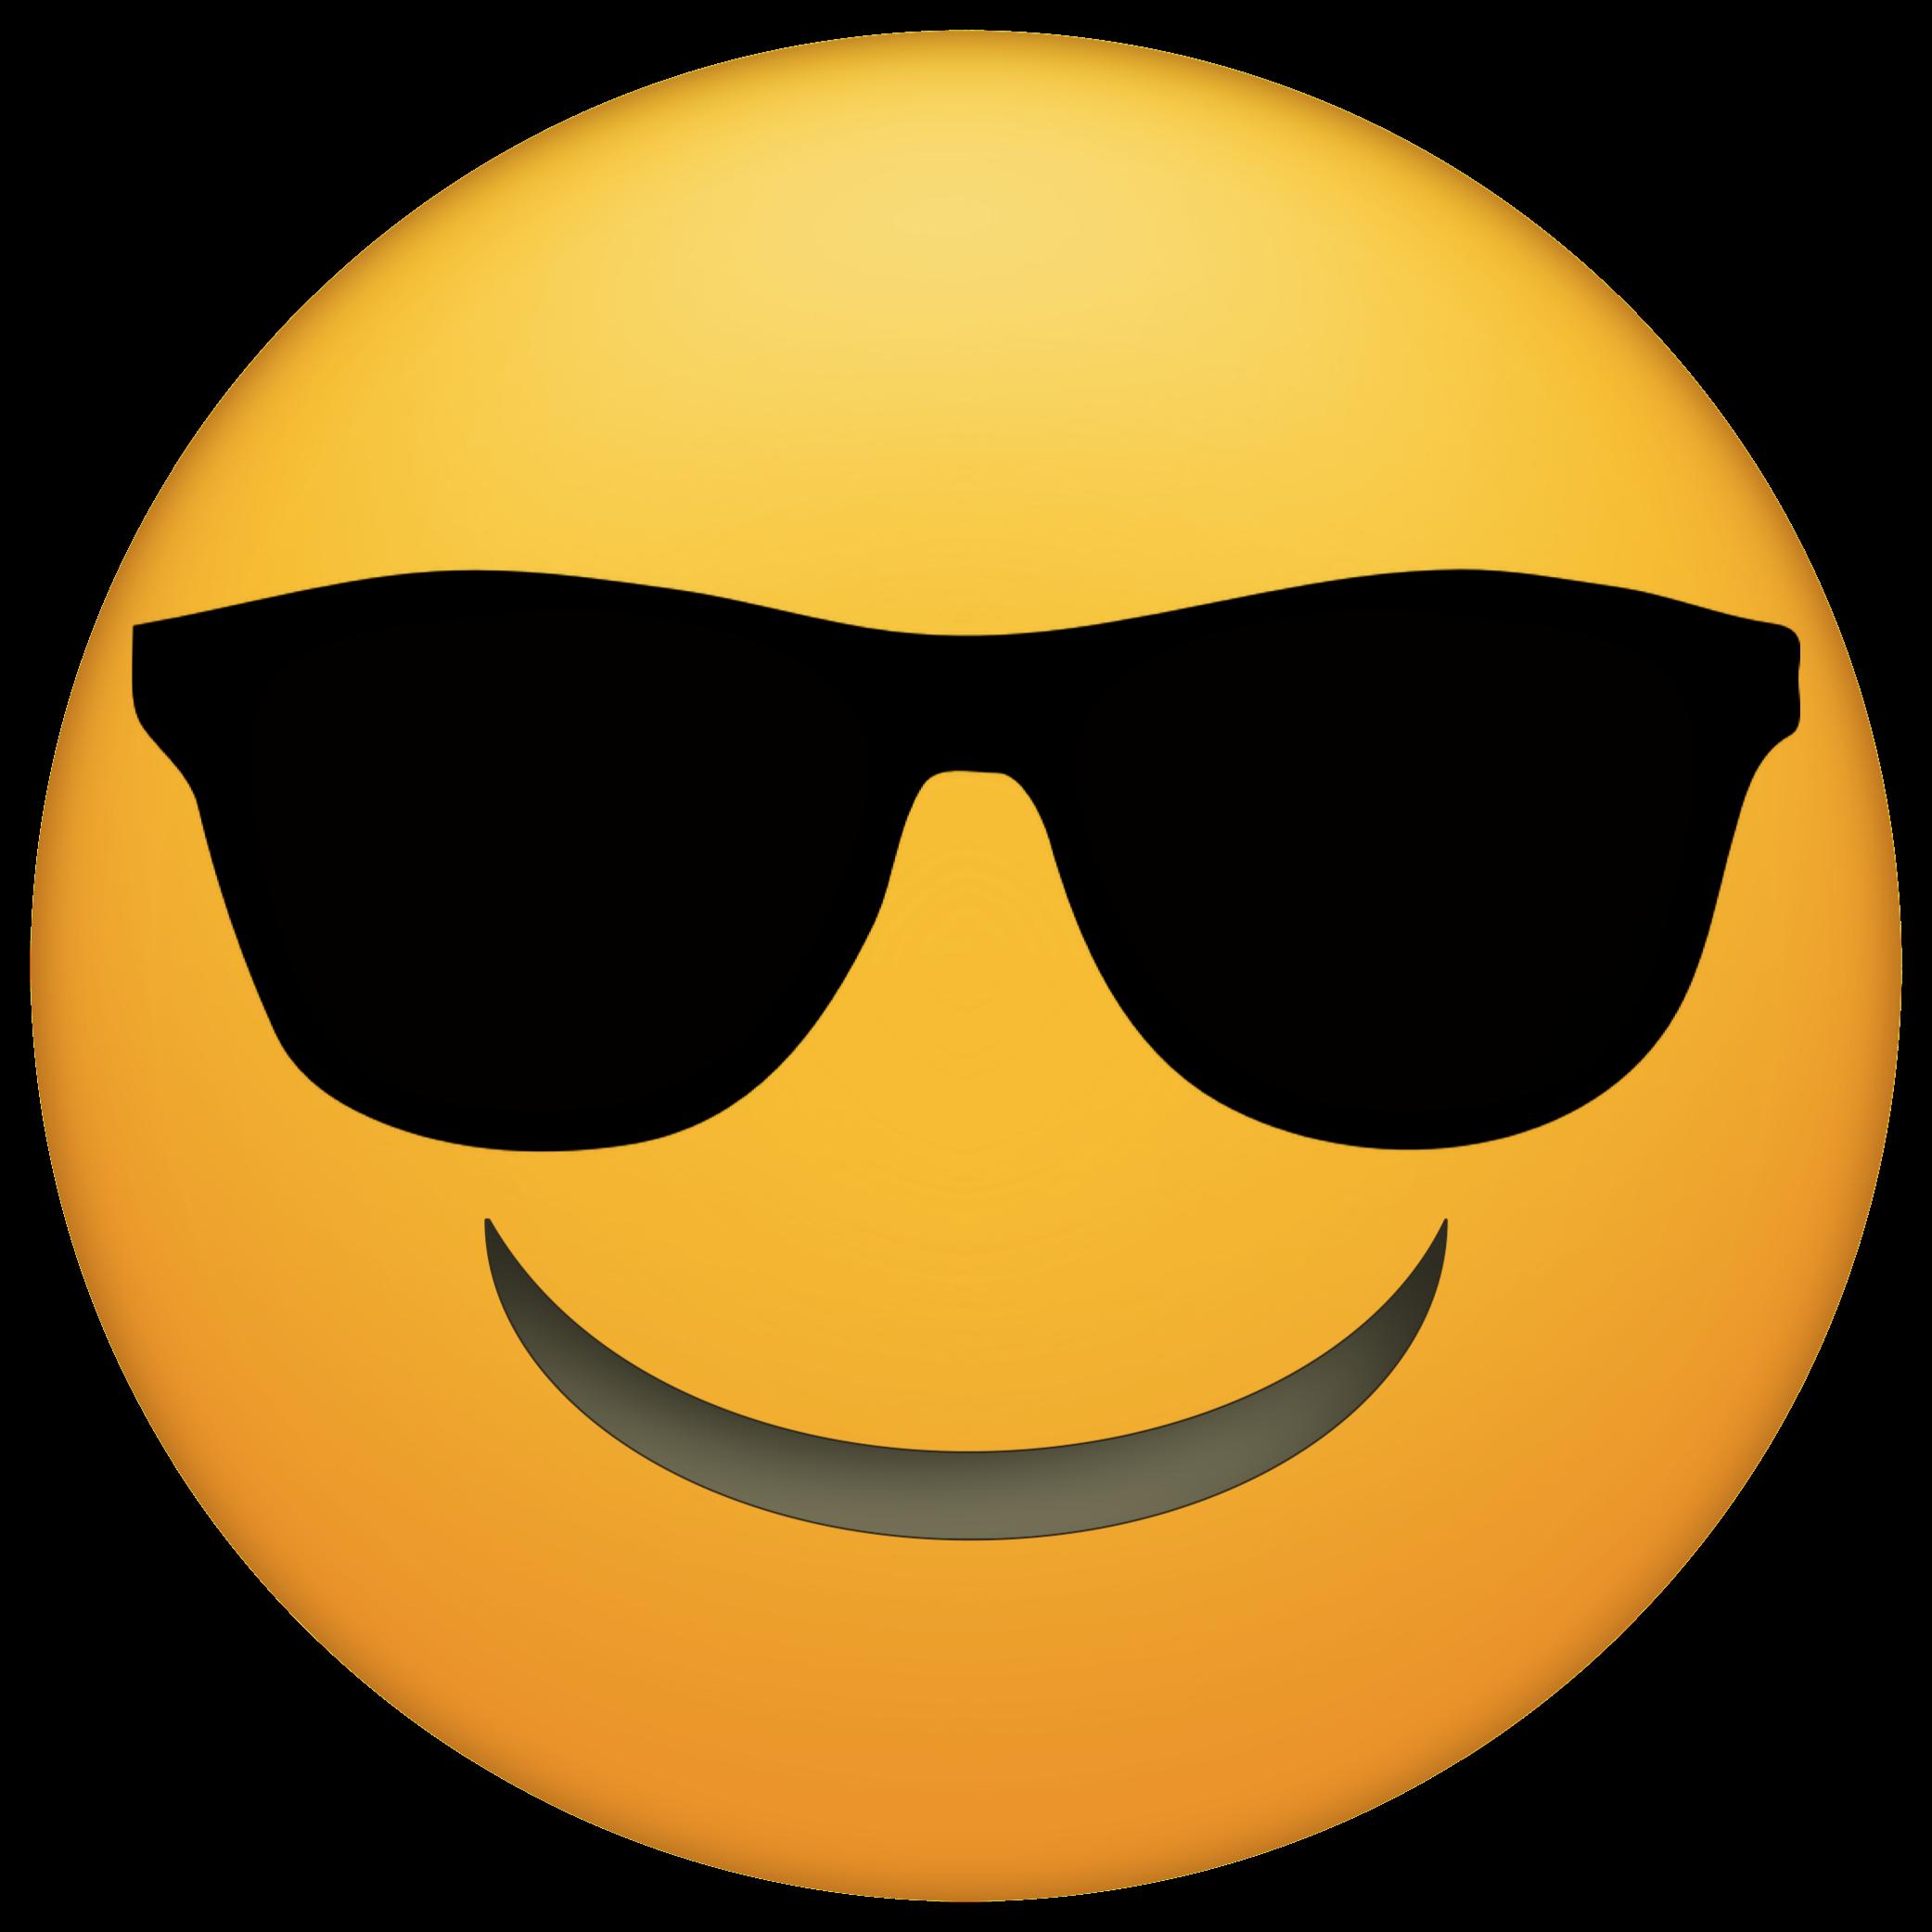 Emoji Sunglasses Png 2083 2083 Molde Emoji Festa Emoji Emoji